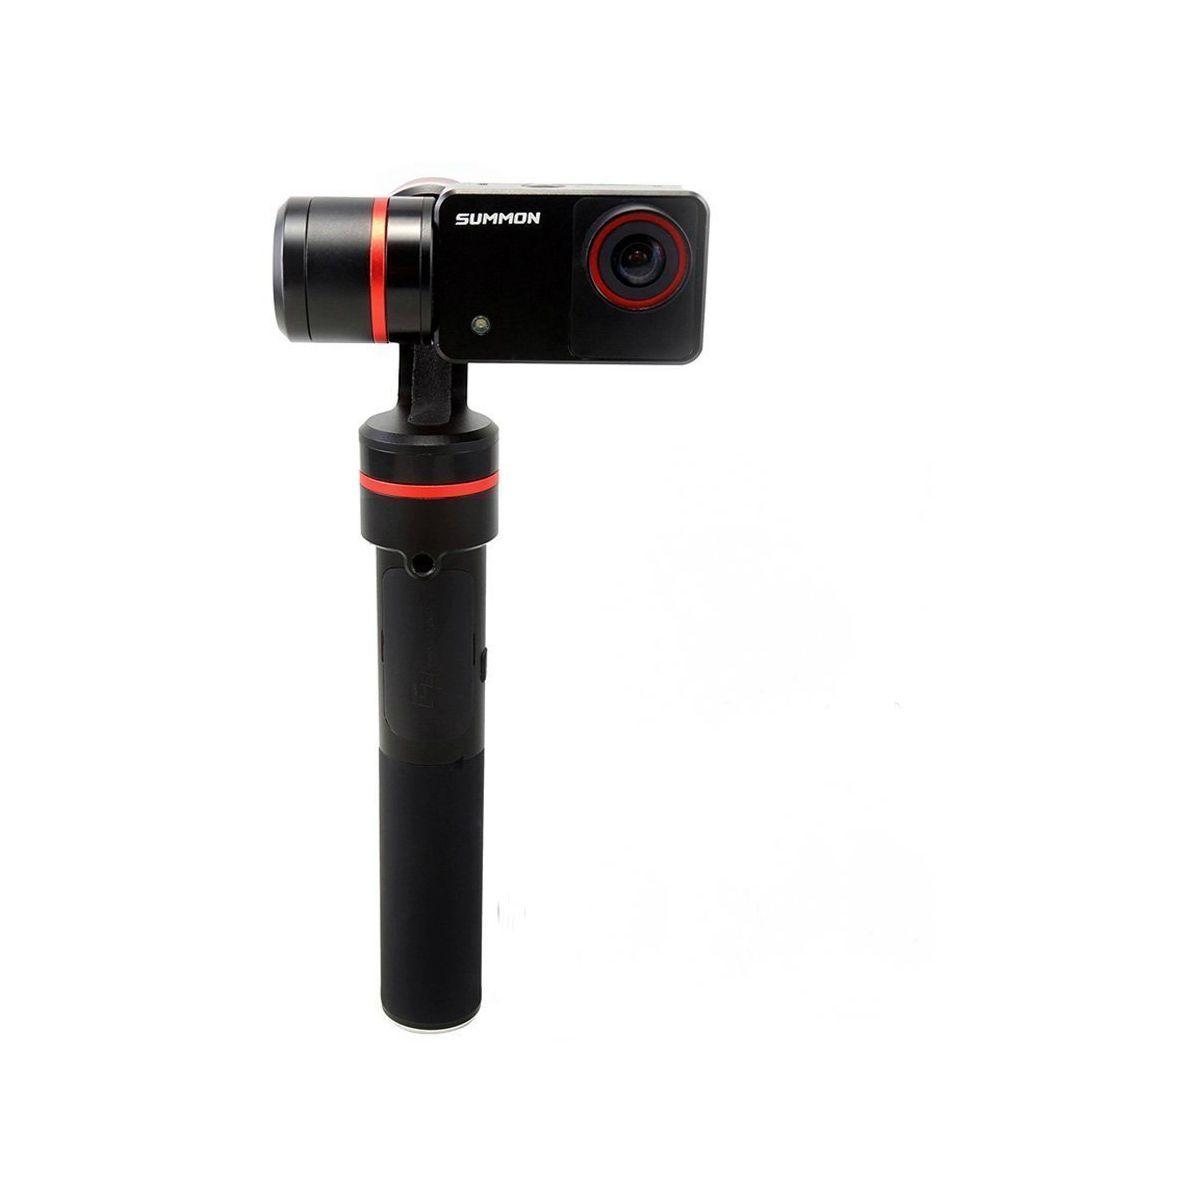 Caméra sp.extr. feiyutech summon + - 7% de remise immédiate avec le code : multi7